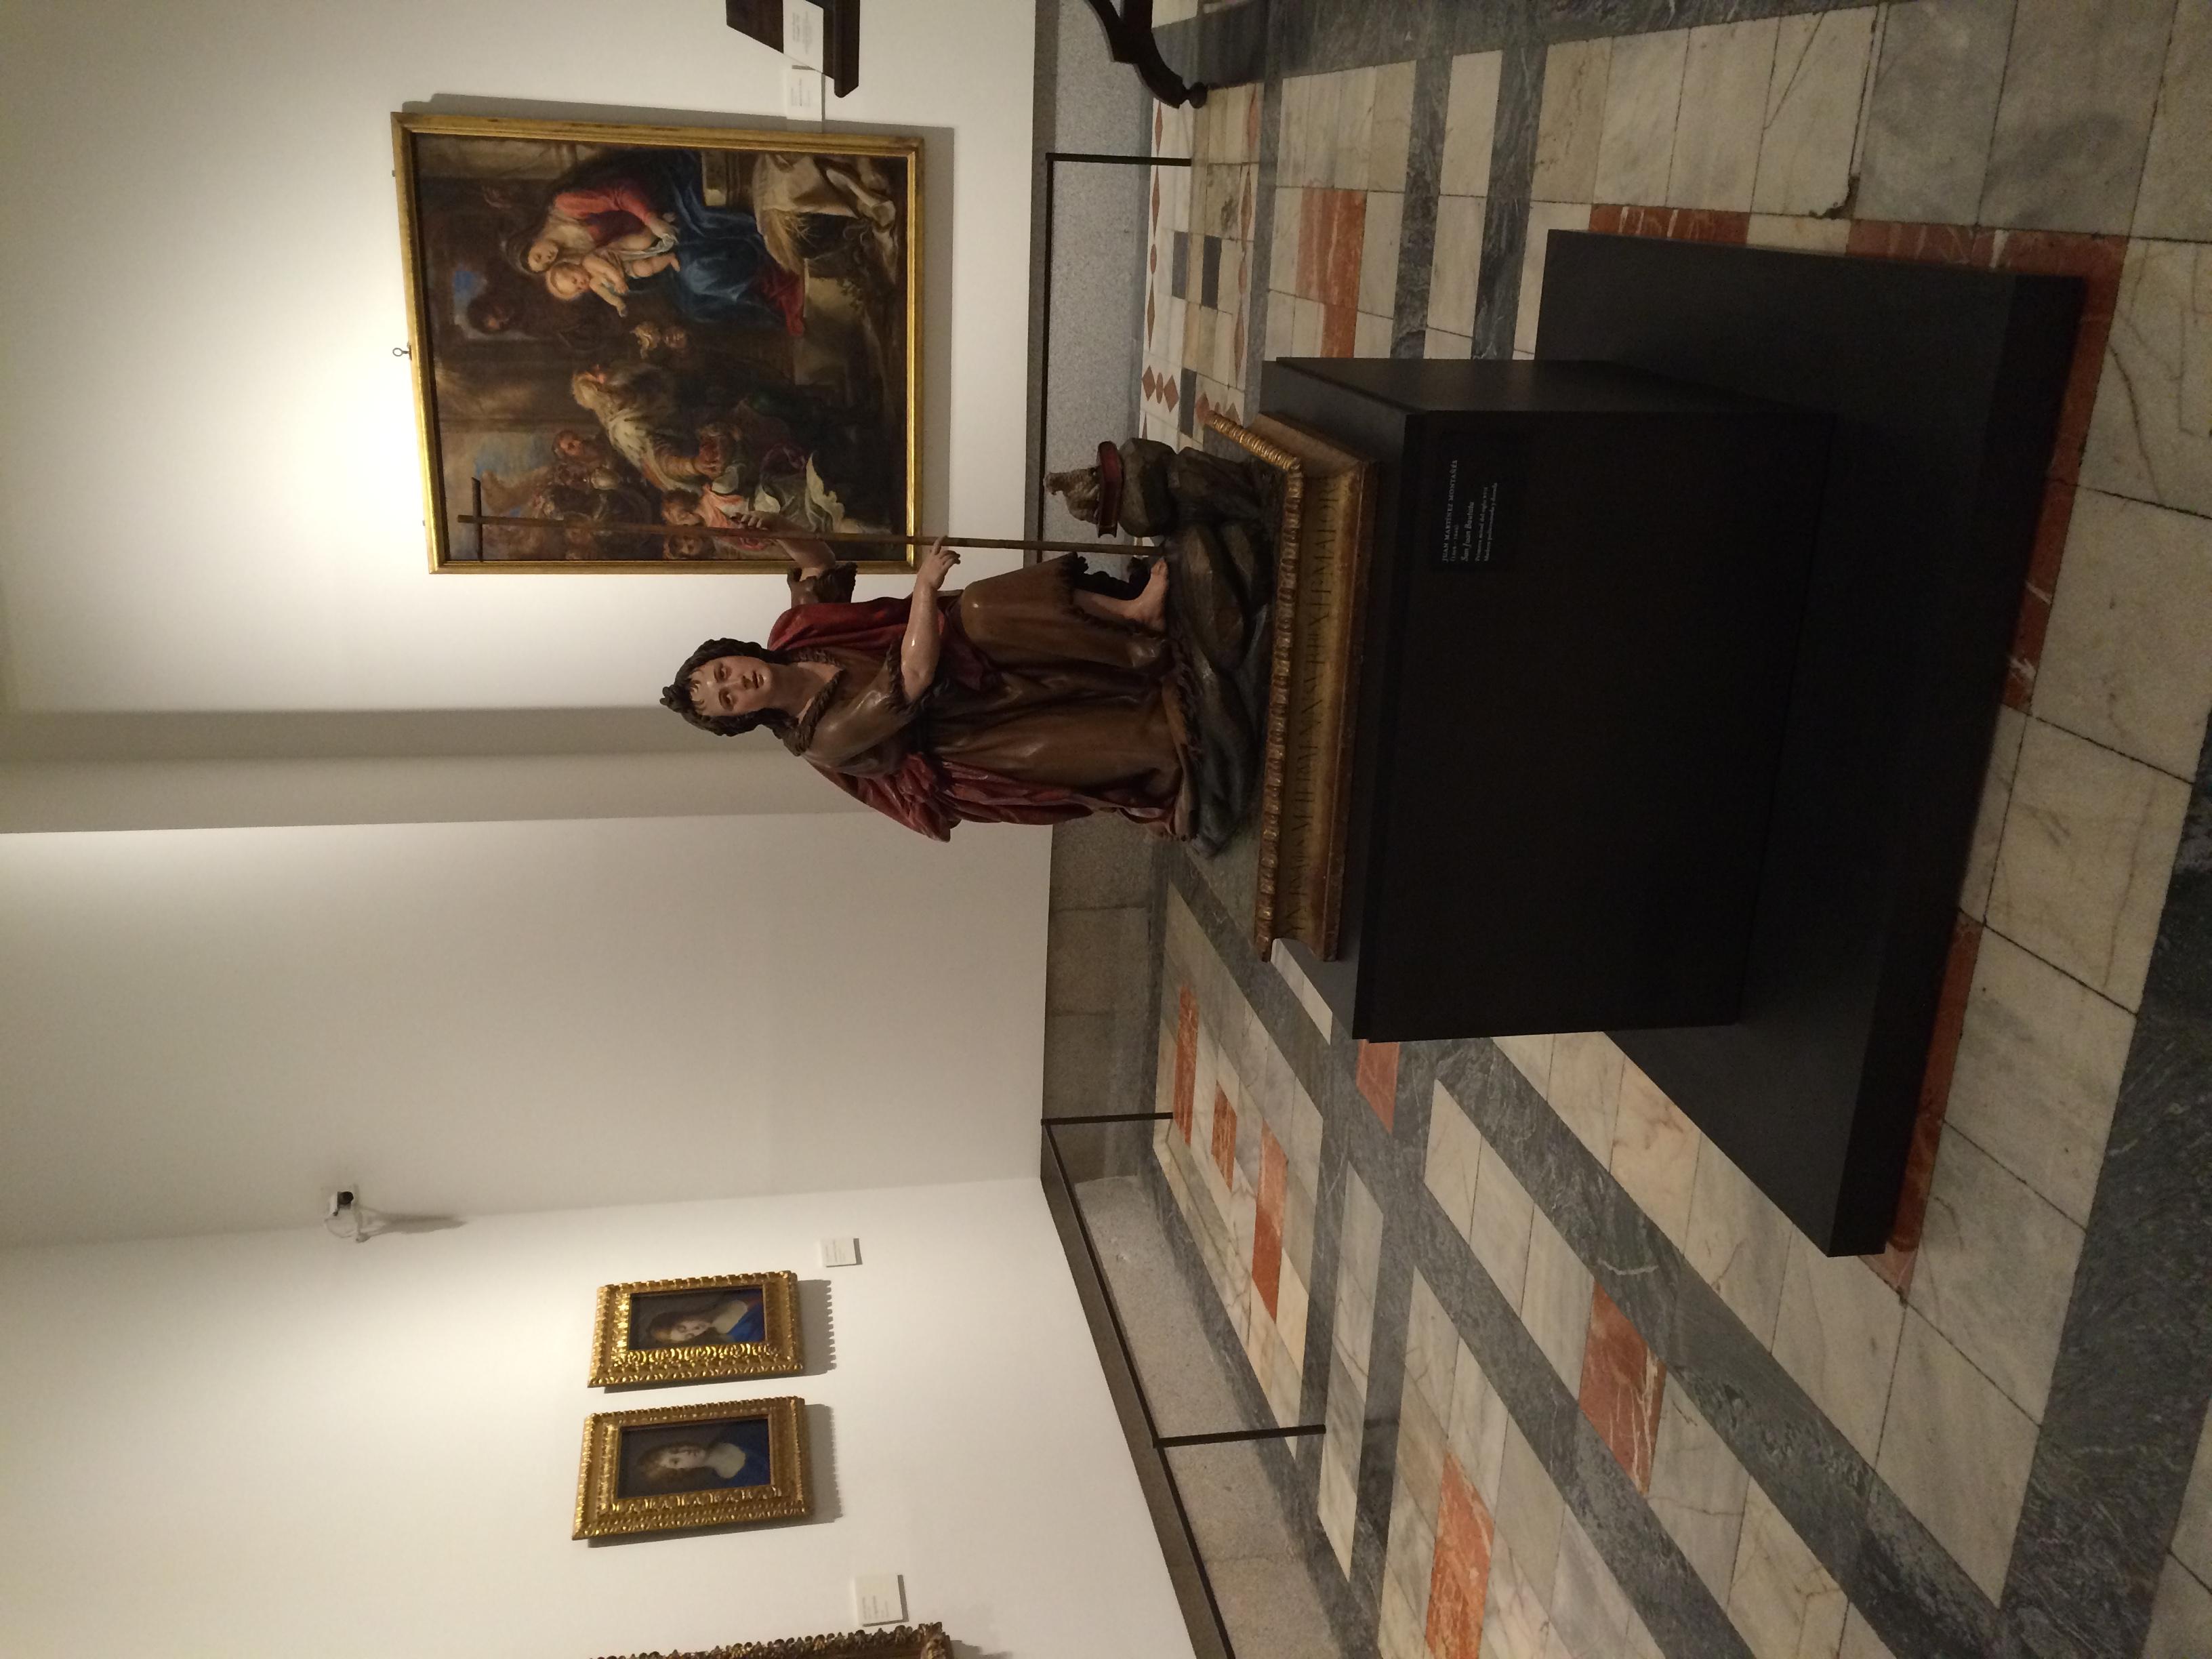 Ypunto_Sacristia_Mayor_Toledo_01.jpg